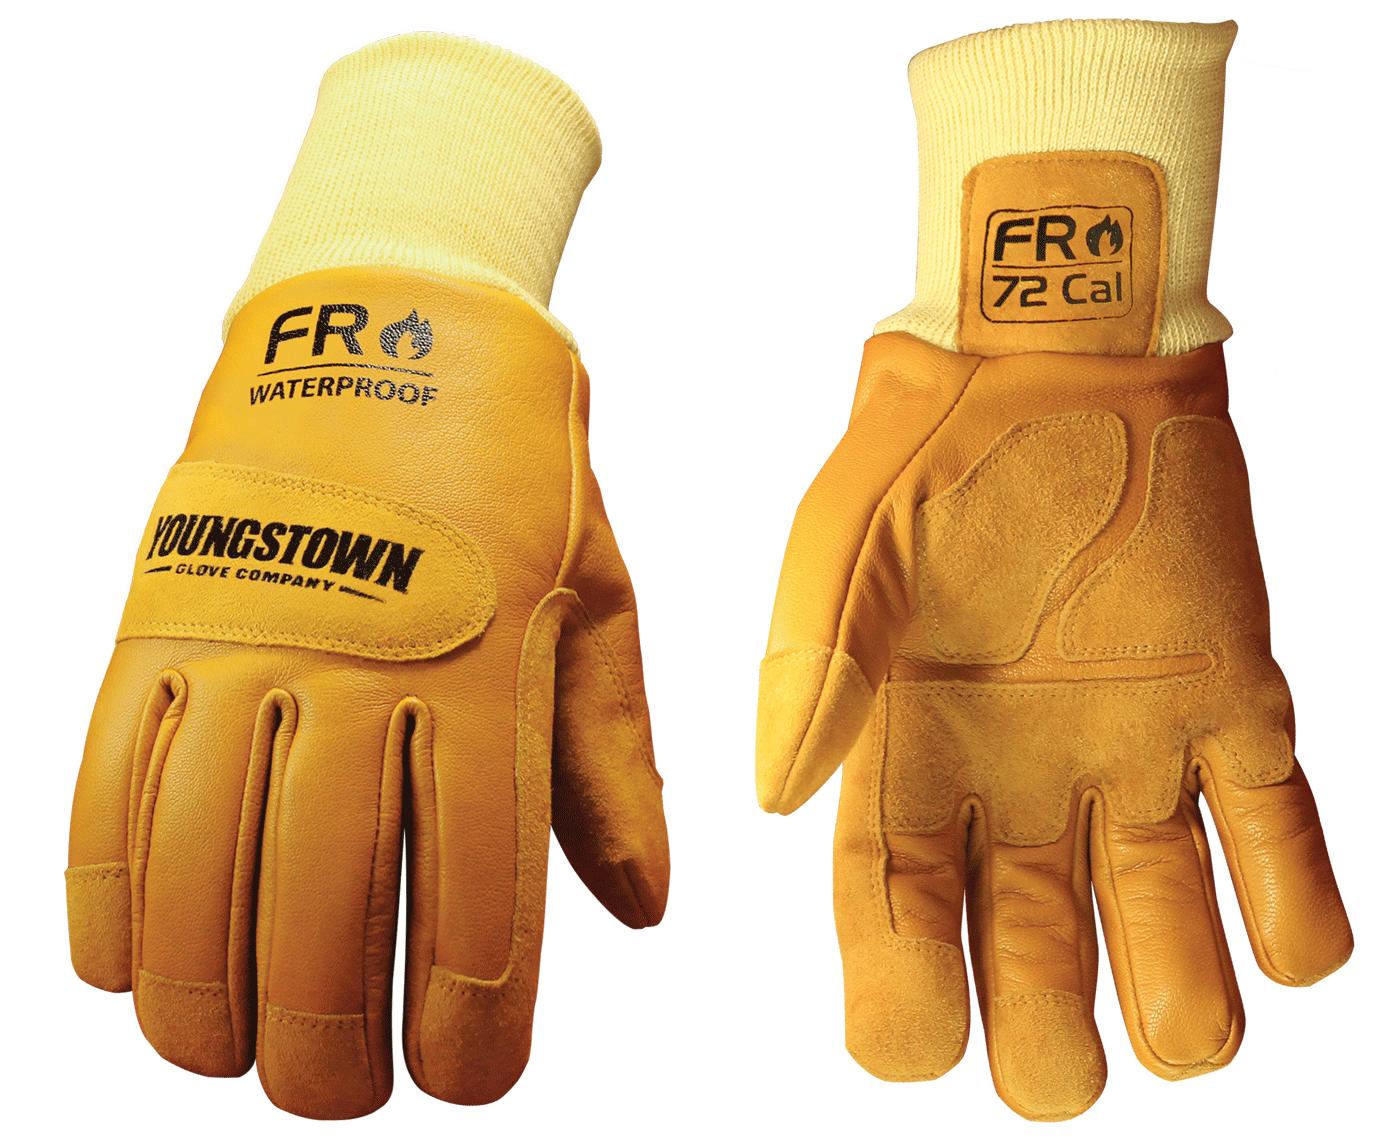 Fr Waterproof Ground Glove Lined W Kevlar With Images Gloves Kevlar Gloves Winter